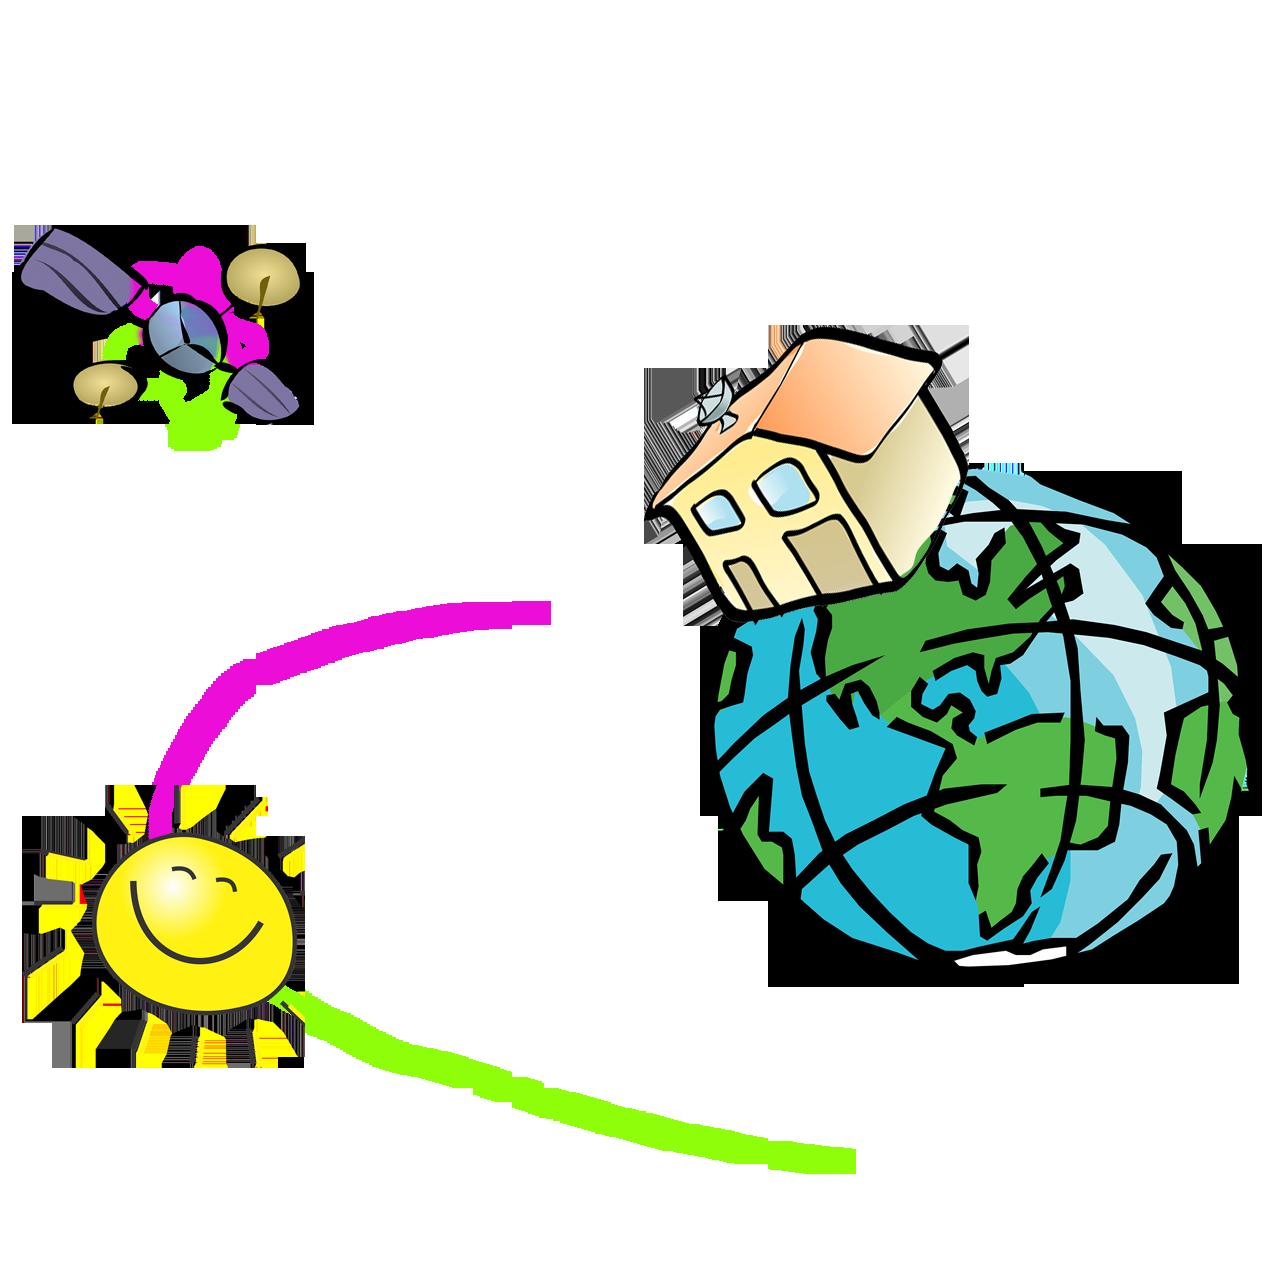 Concepts mockingbirdnest principia wiki. Clipart rocket trajectory